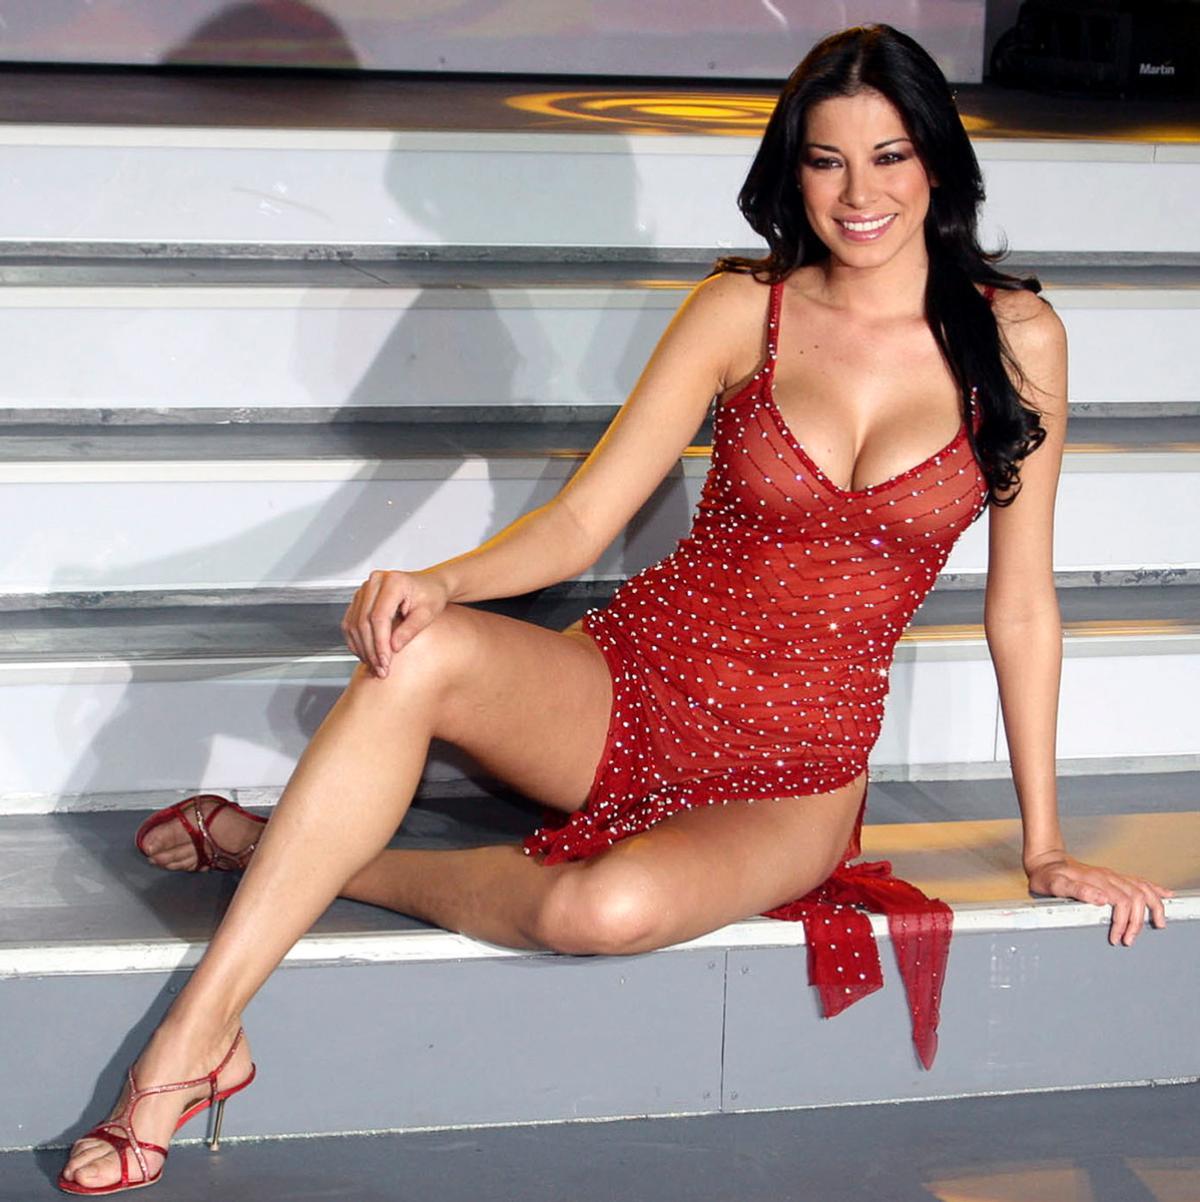 Bikini Ludmila Isabella naked (35 photos), Tits, Leaked, Twitter, braless 2015